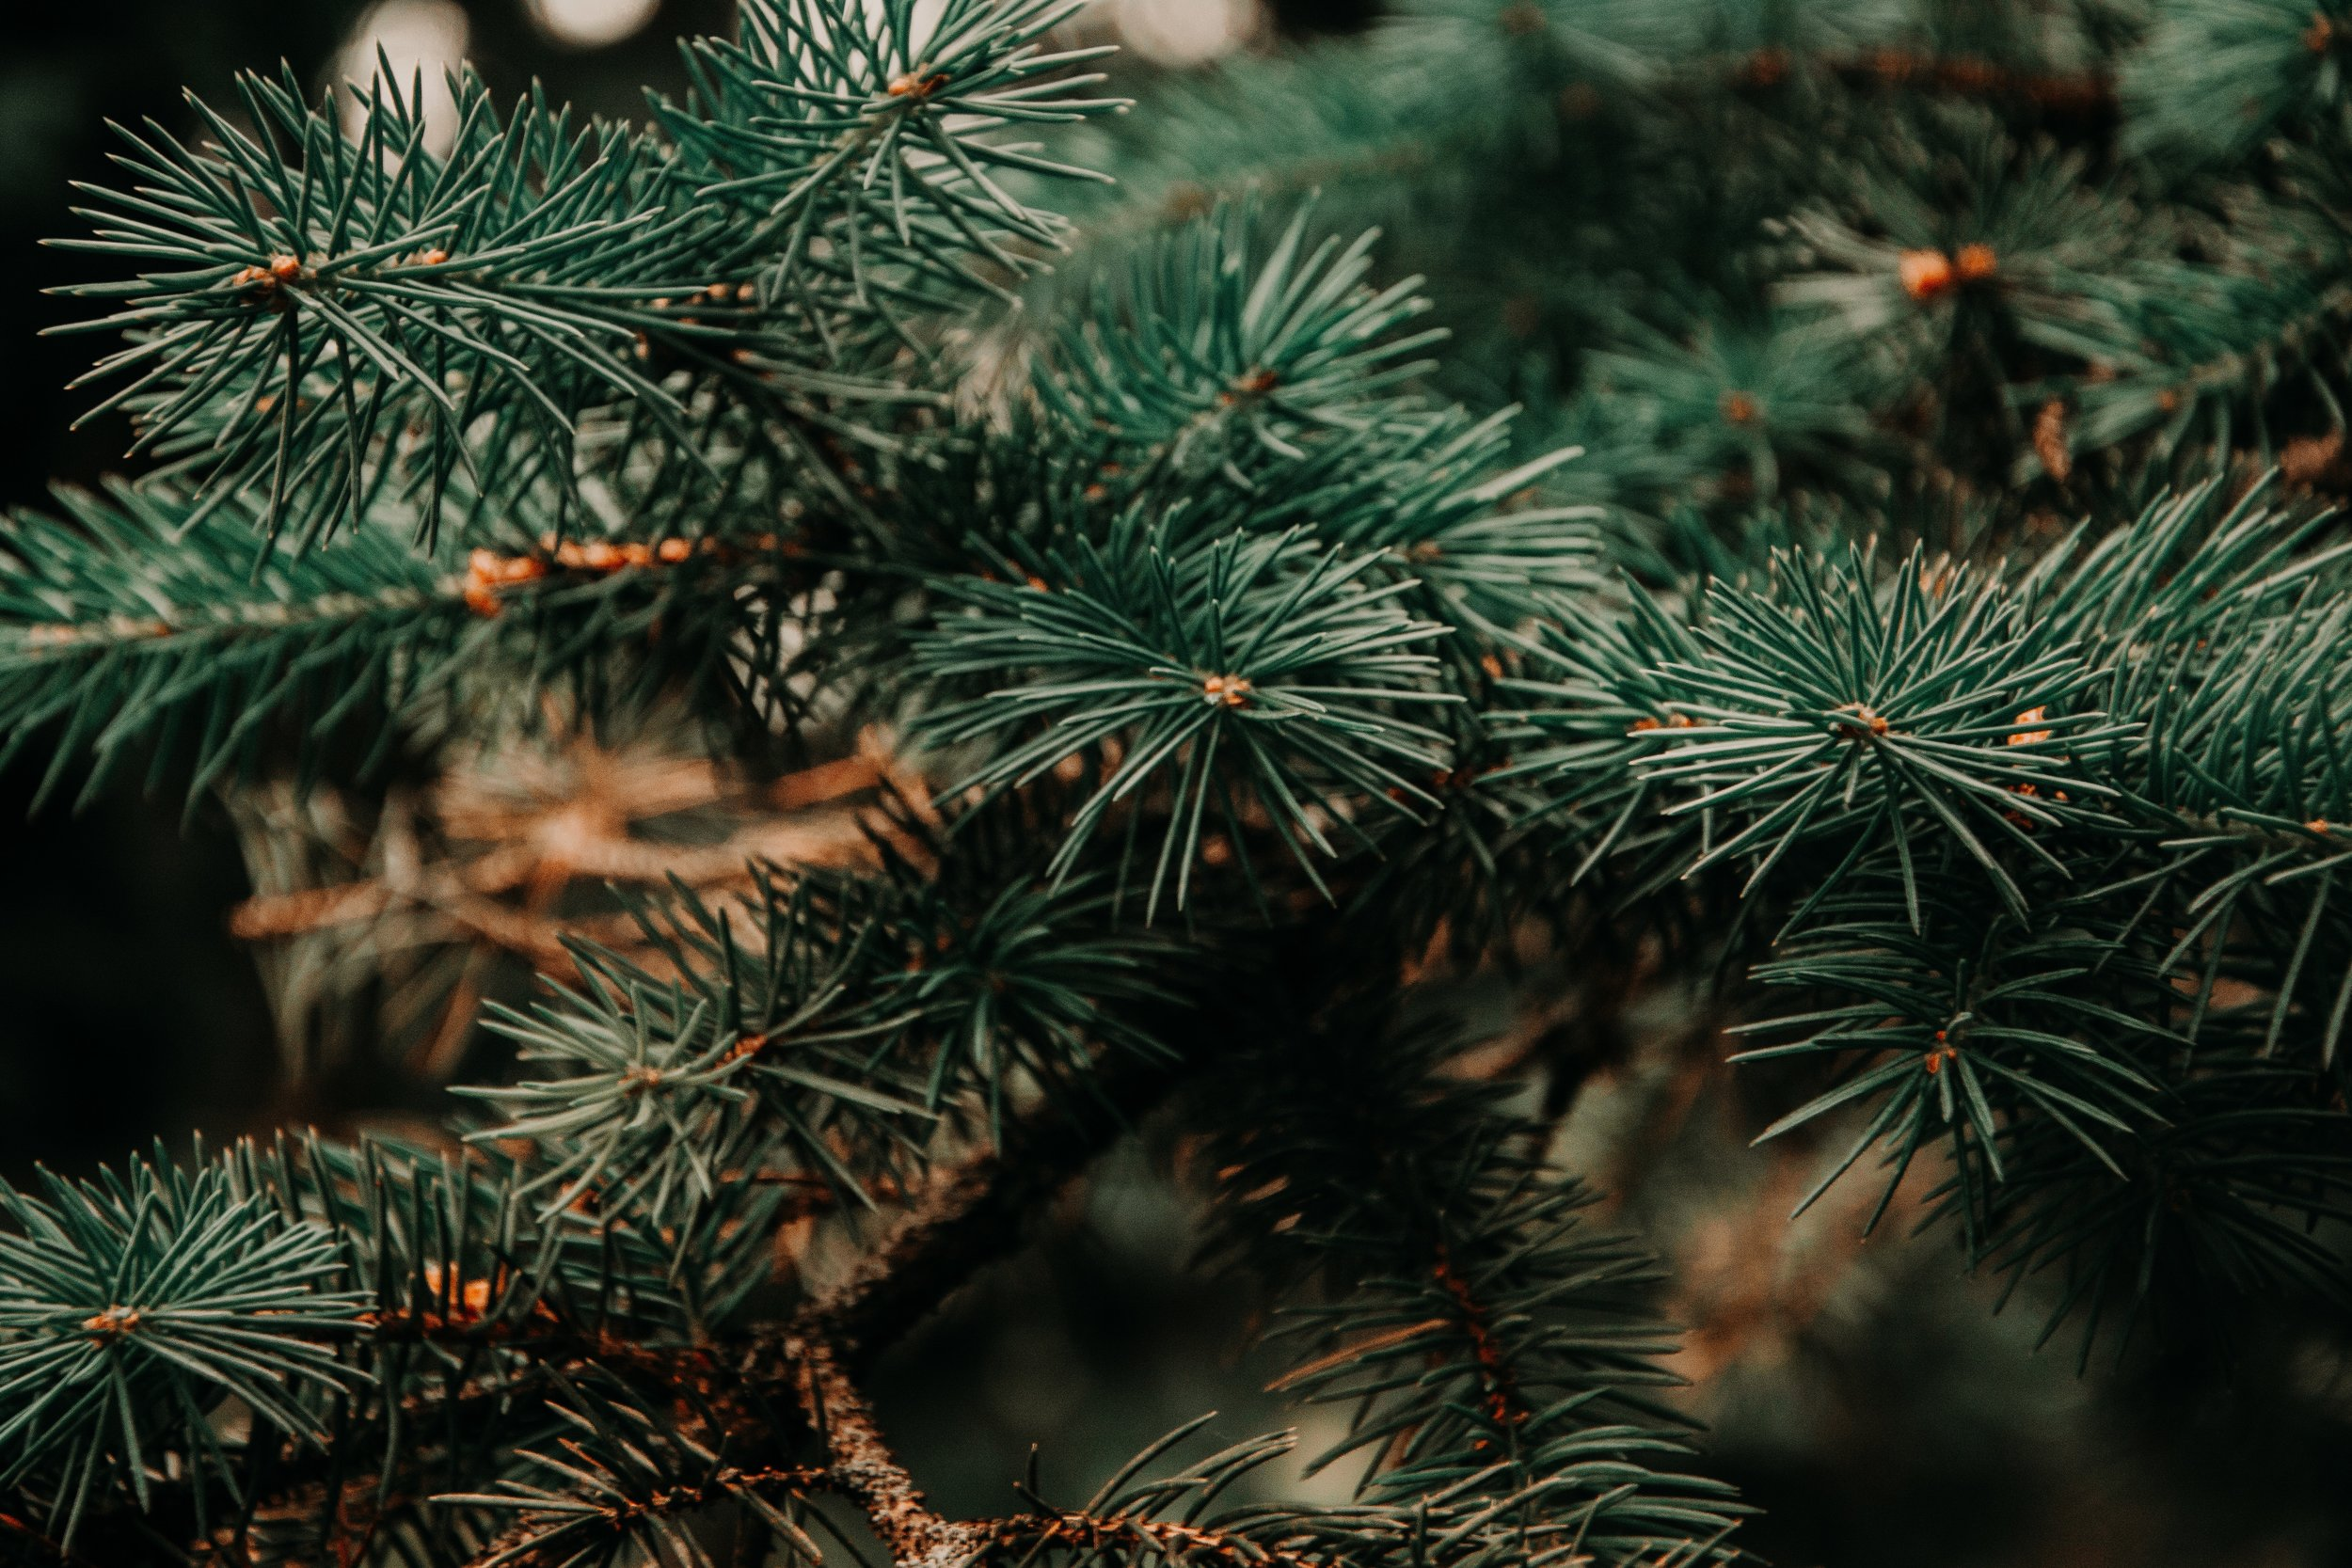 branch-christmas-tree-close-up-943900.jpg